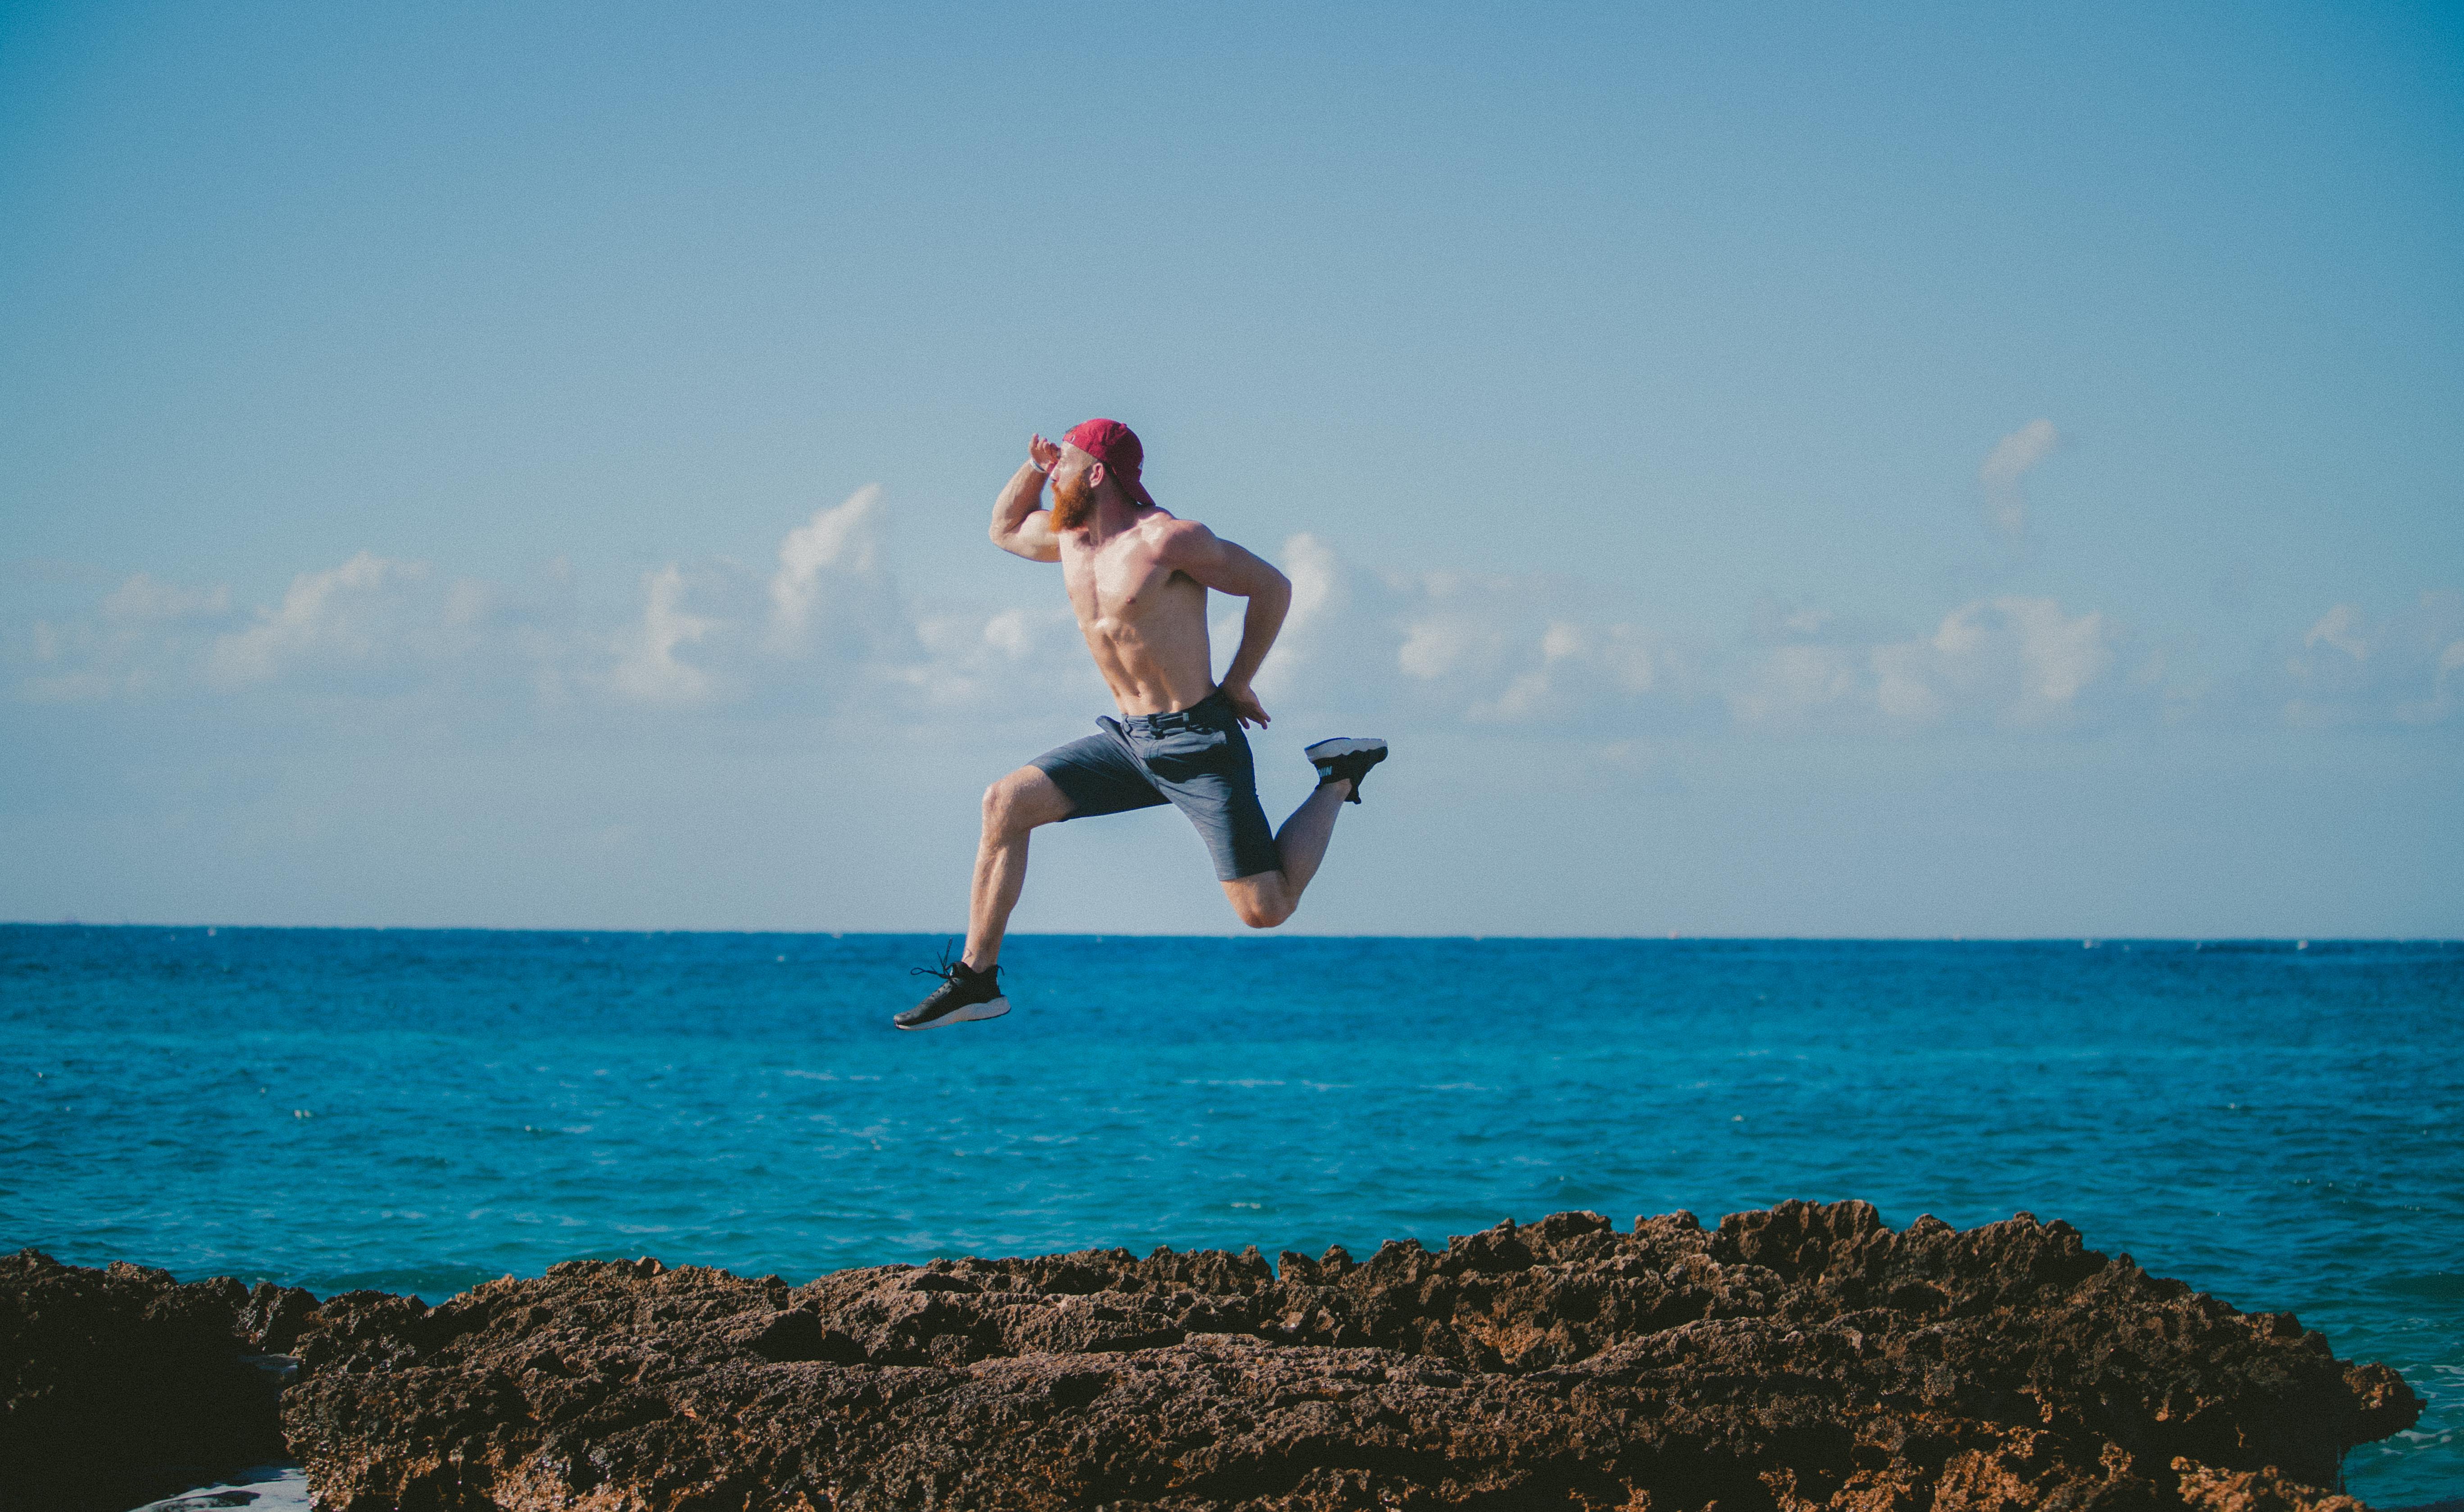 картинки прыжок море видео сиа